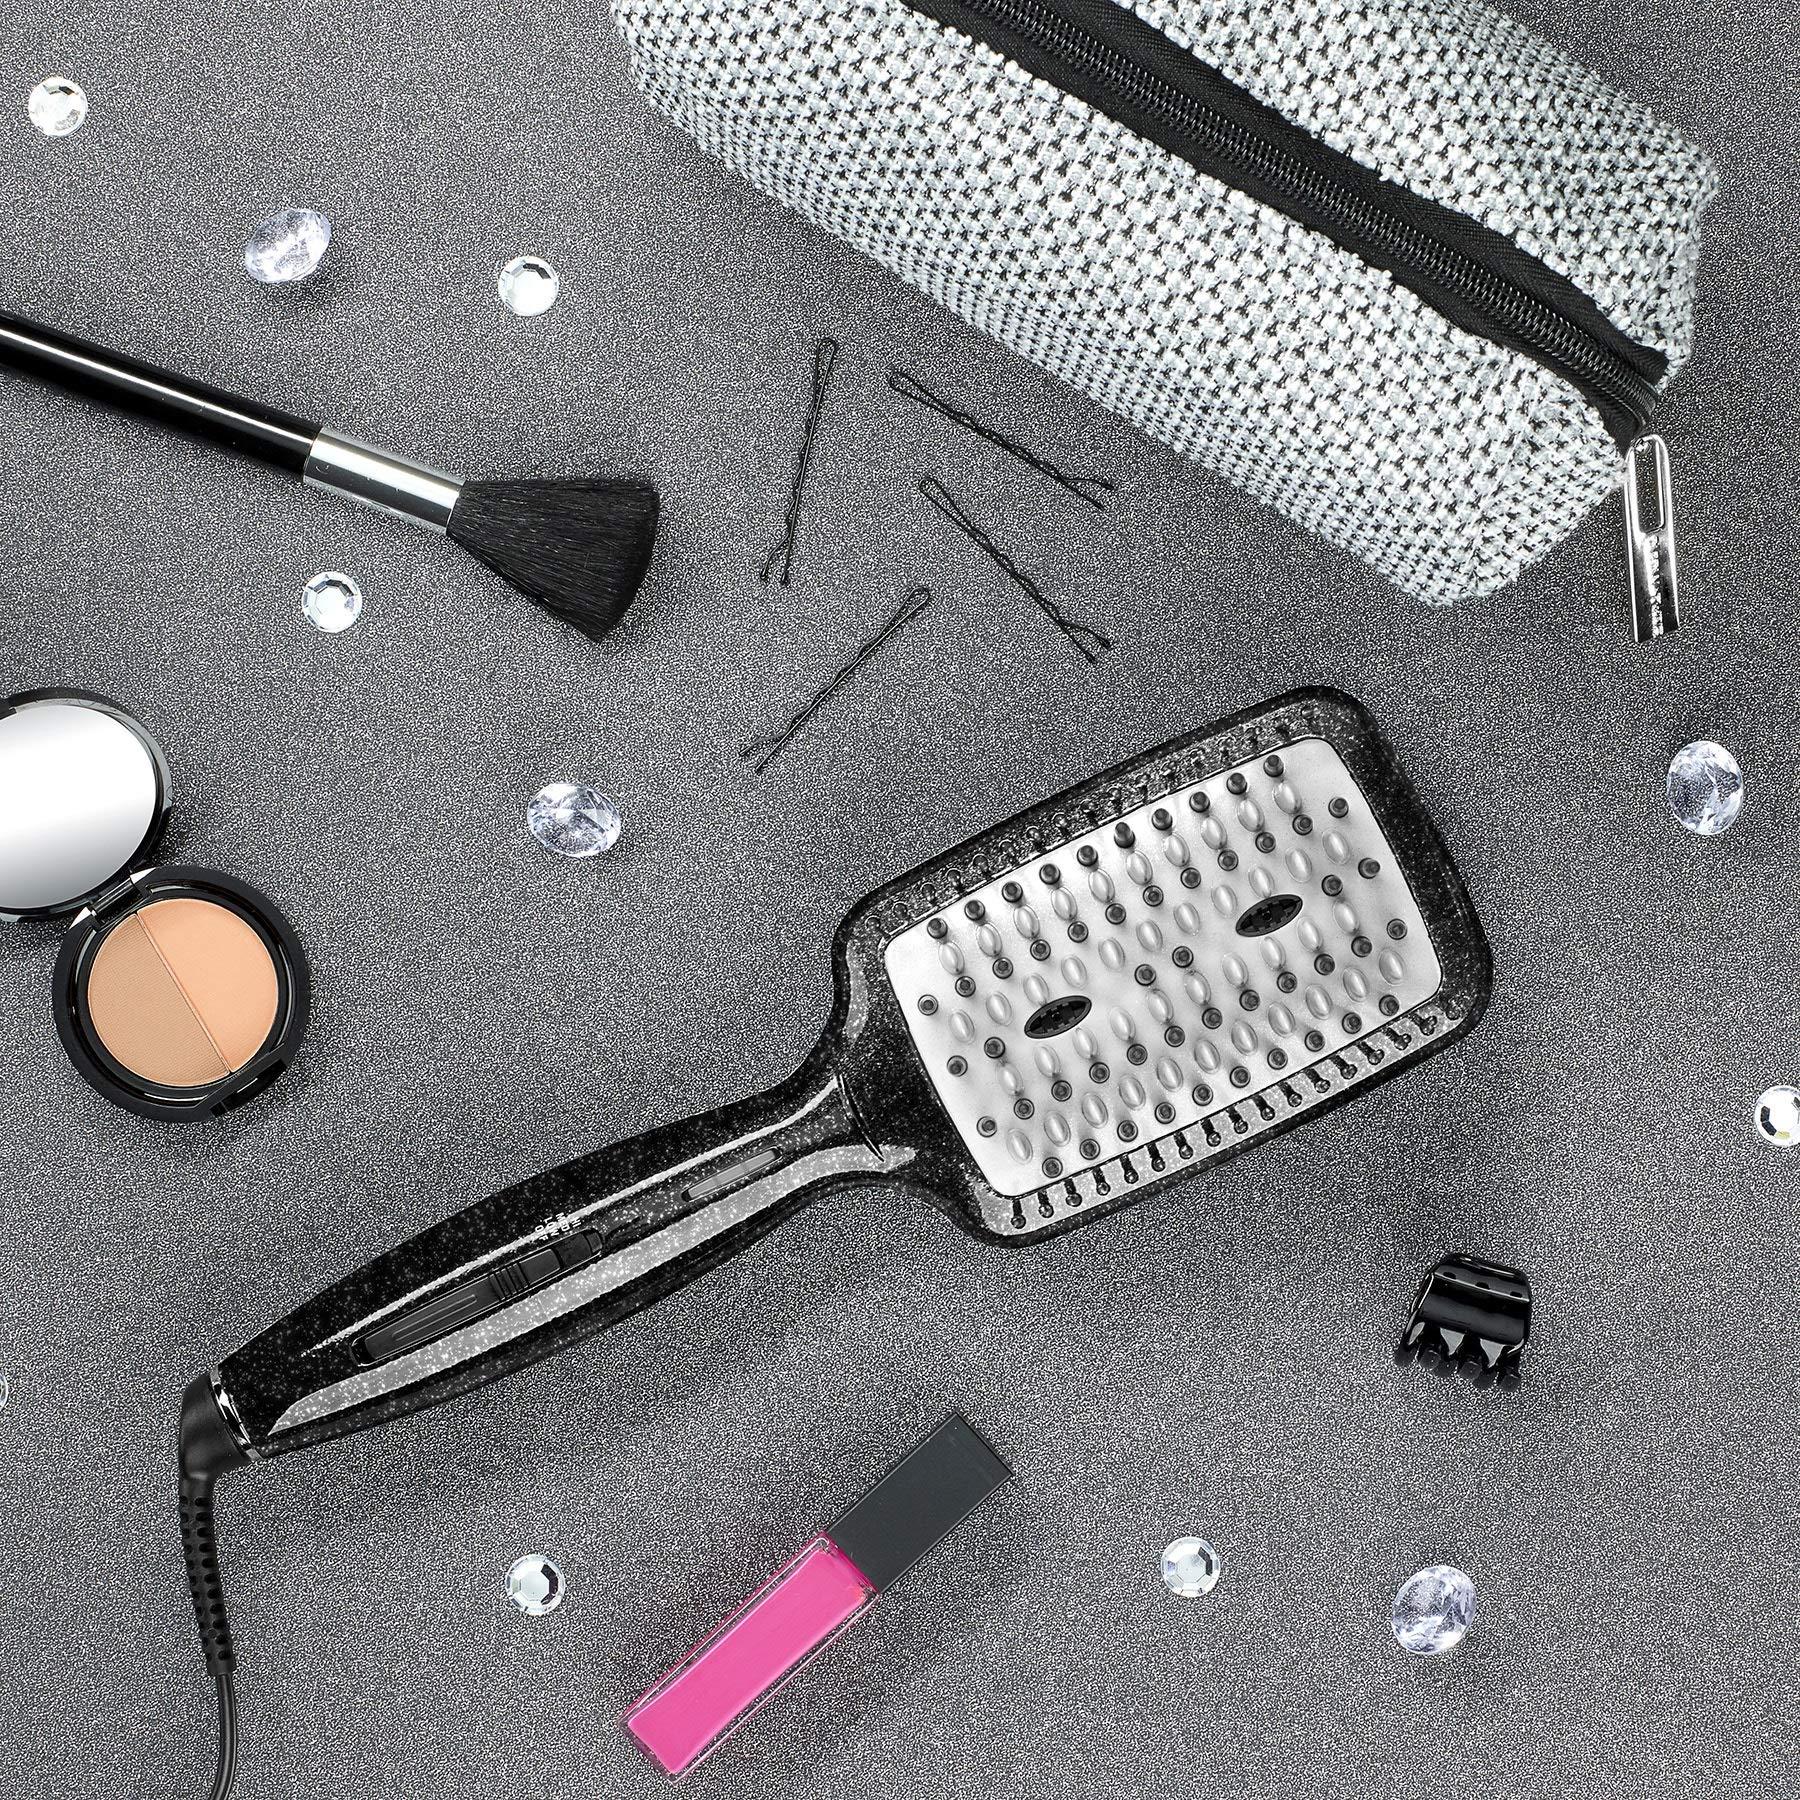 INFINITIPRO BY CONAIR Diamond-Infused Ceramic Smoothing Hot Brush/Straightening Brush; Black by Conair (Image #6)